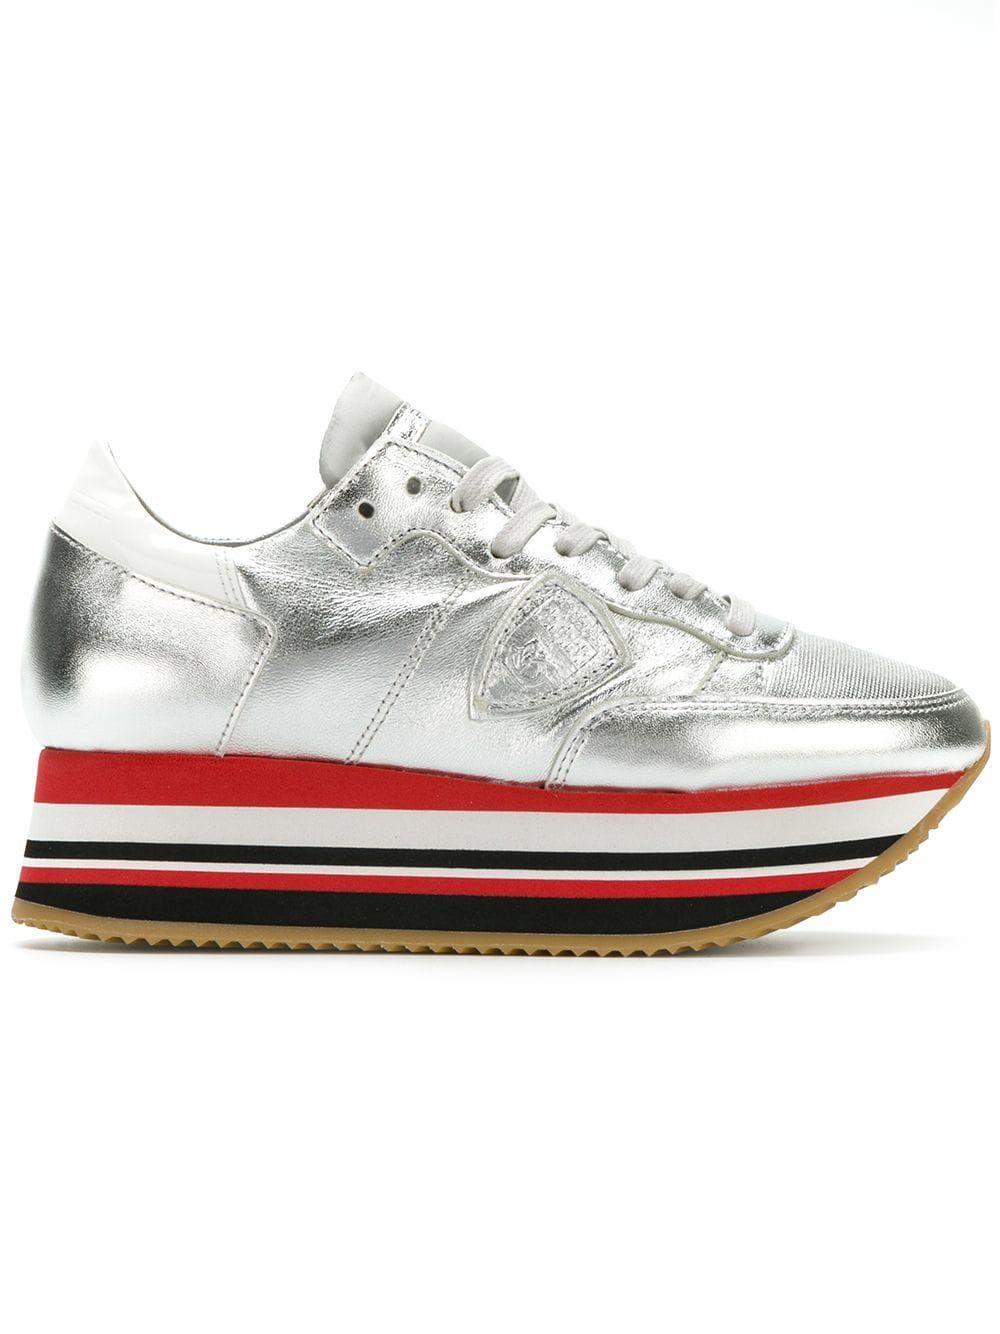 PHILIPPE MODEL | Eiffel sneakers #Shoes